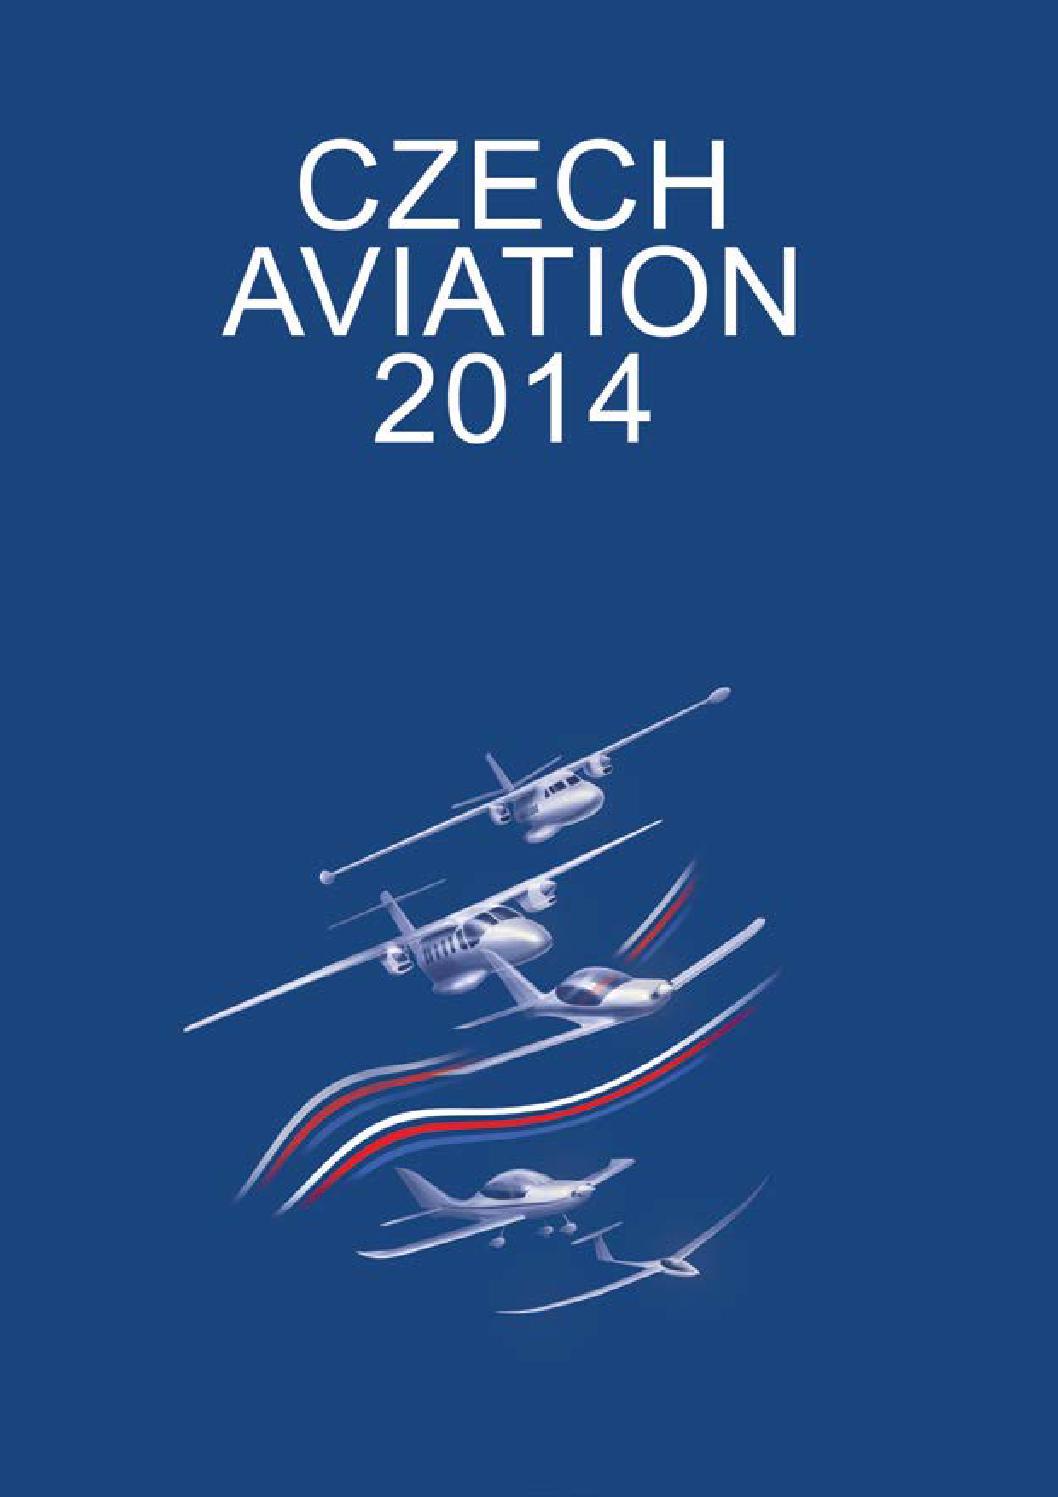 Czech Aviation 2014 By Laa Cr Issuu